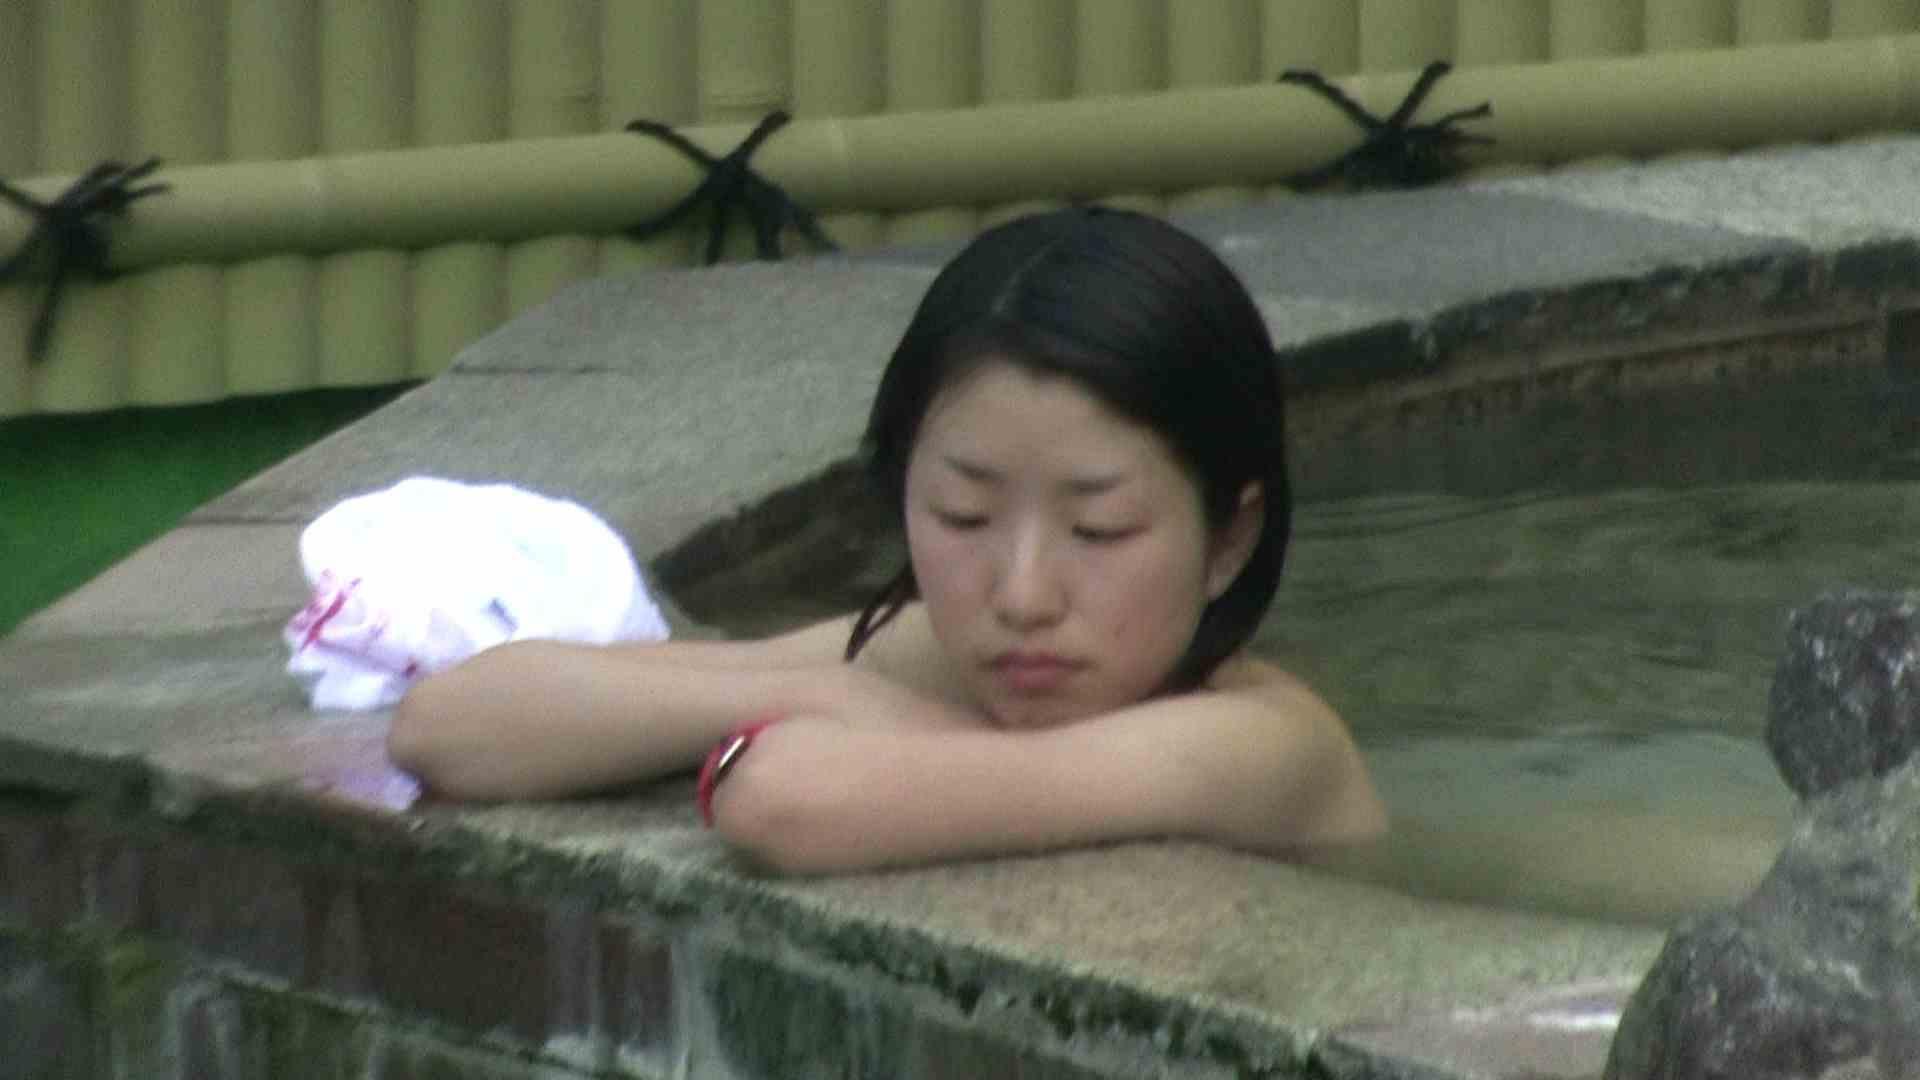 Aquaな露天風呂Vol.133 0 | 0  19連発 1